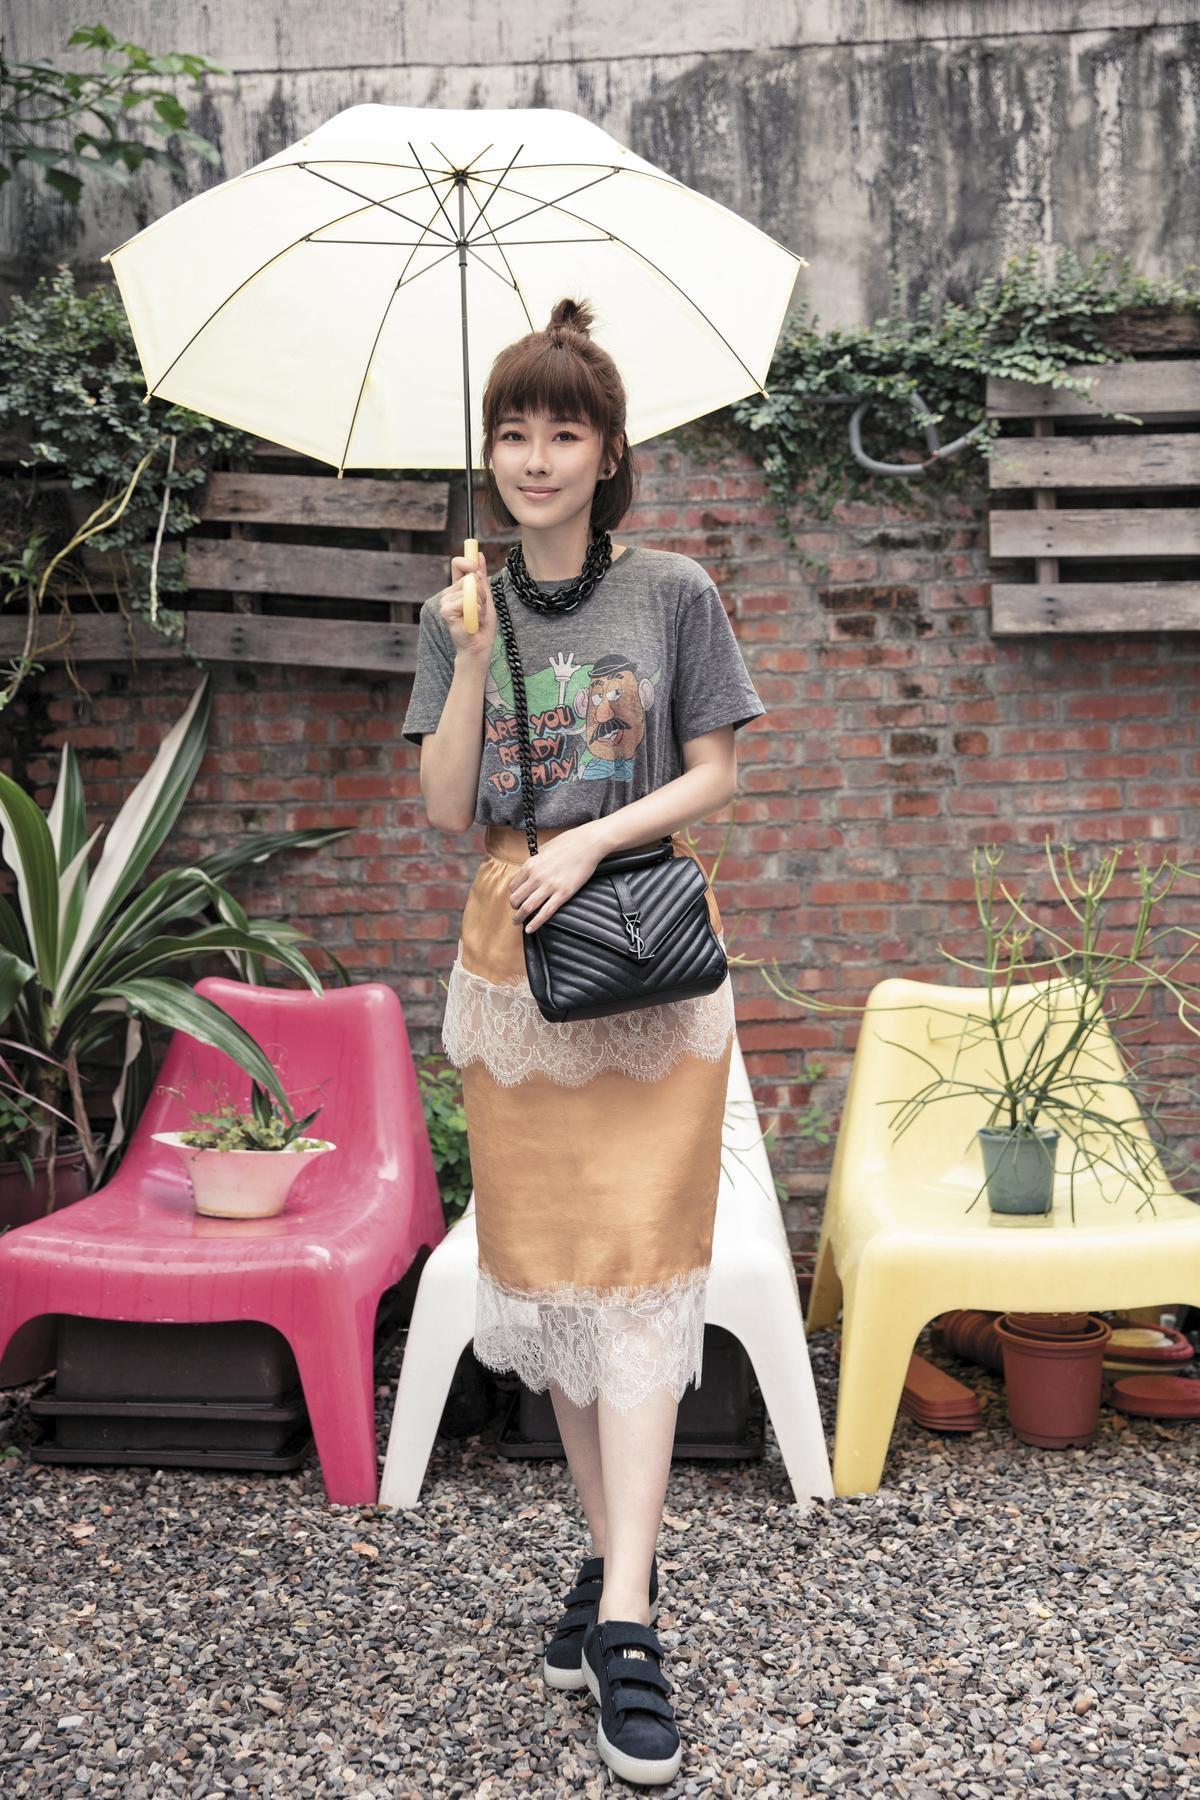 Double Name灰色T-Shirt,約NT$1,500;MAMA STUDIO芥末黃色蕾絲裙,約NT$2,000;YSL鍊帶包,約NT$80,000;PUMA x CAREAU聯名鞋款,約NT$5,000。